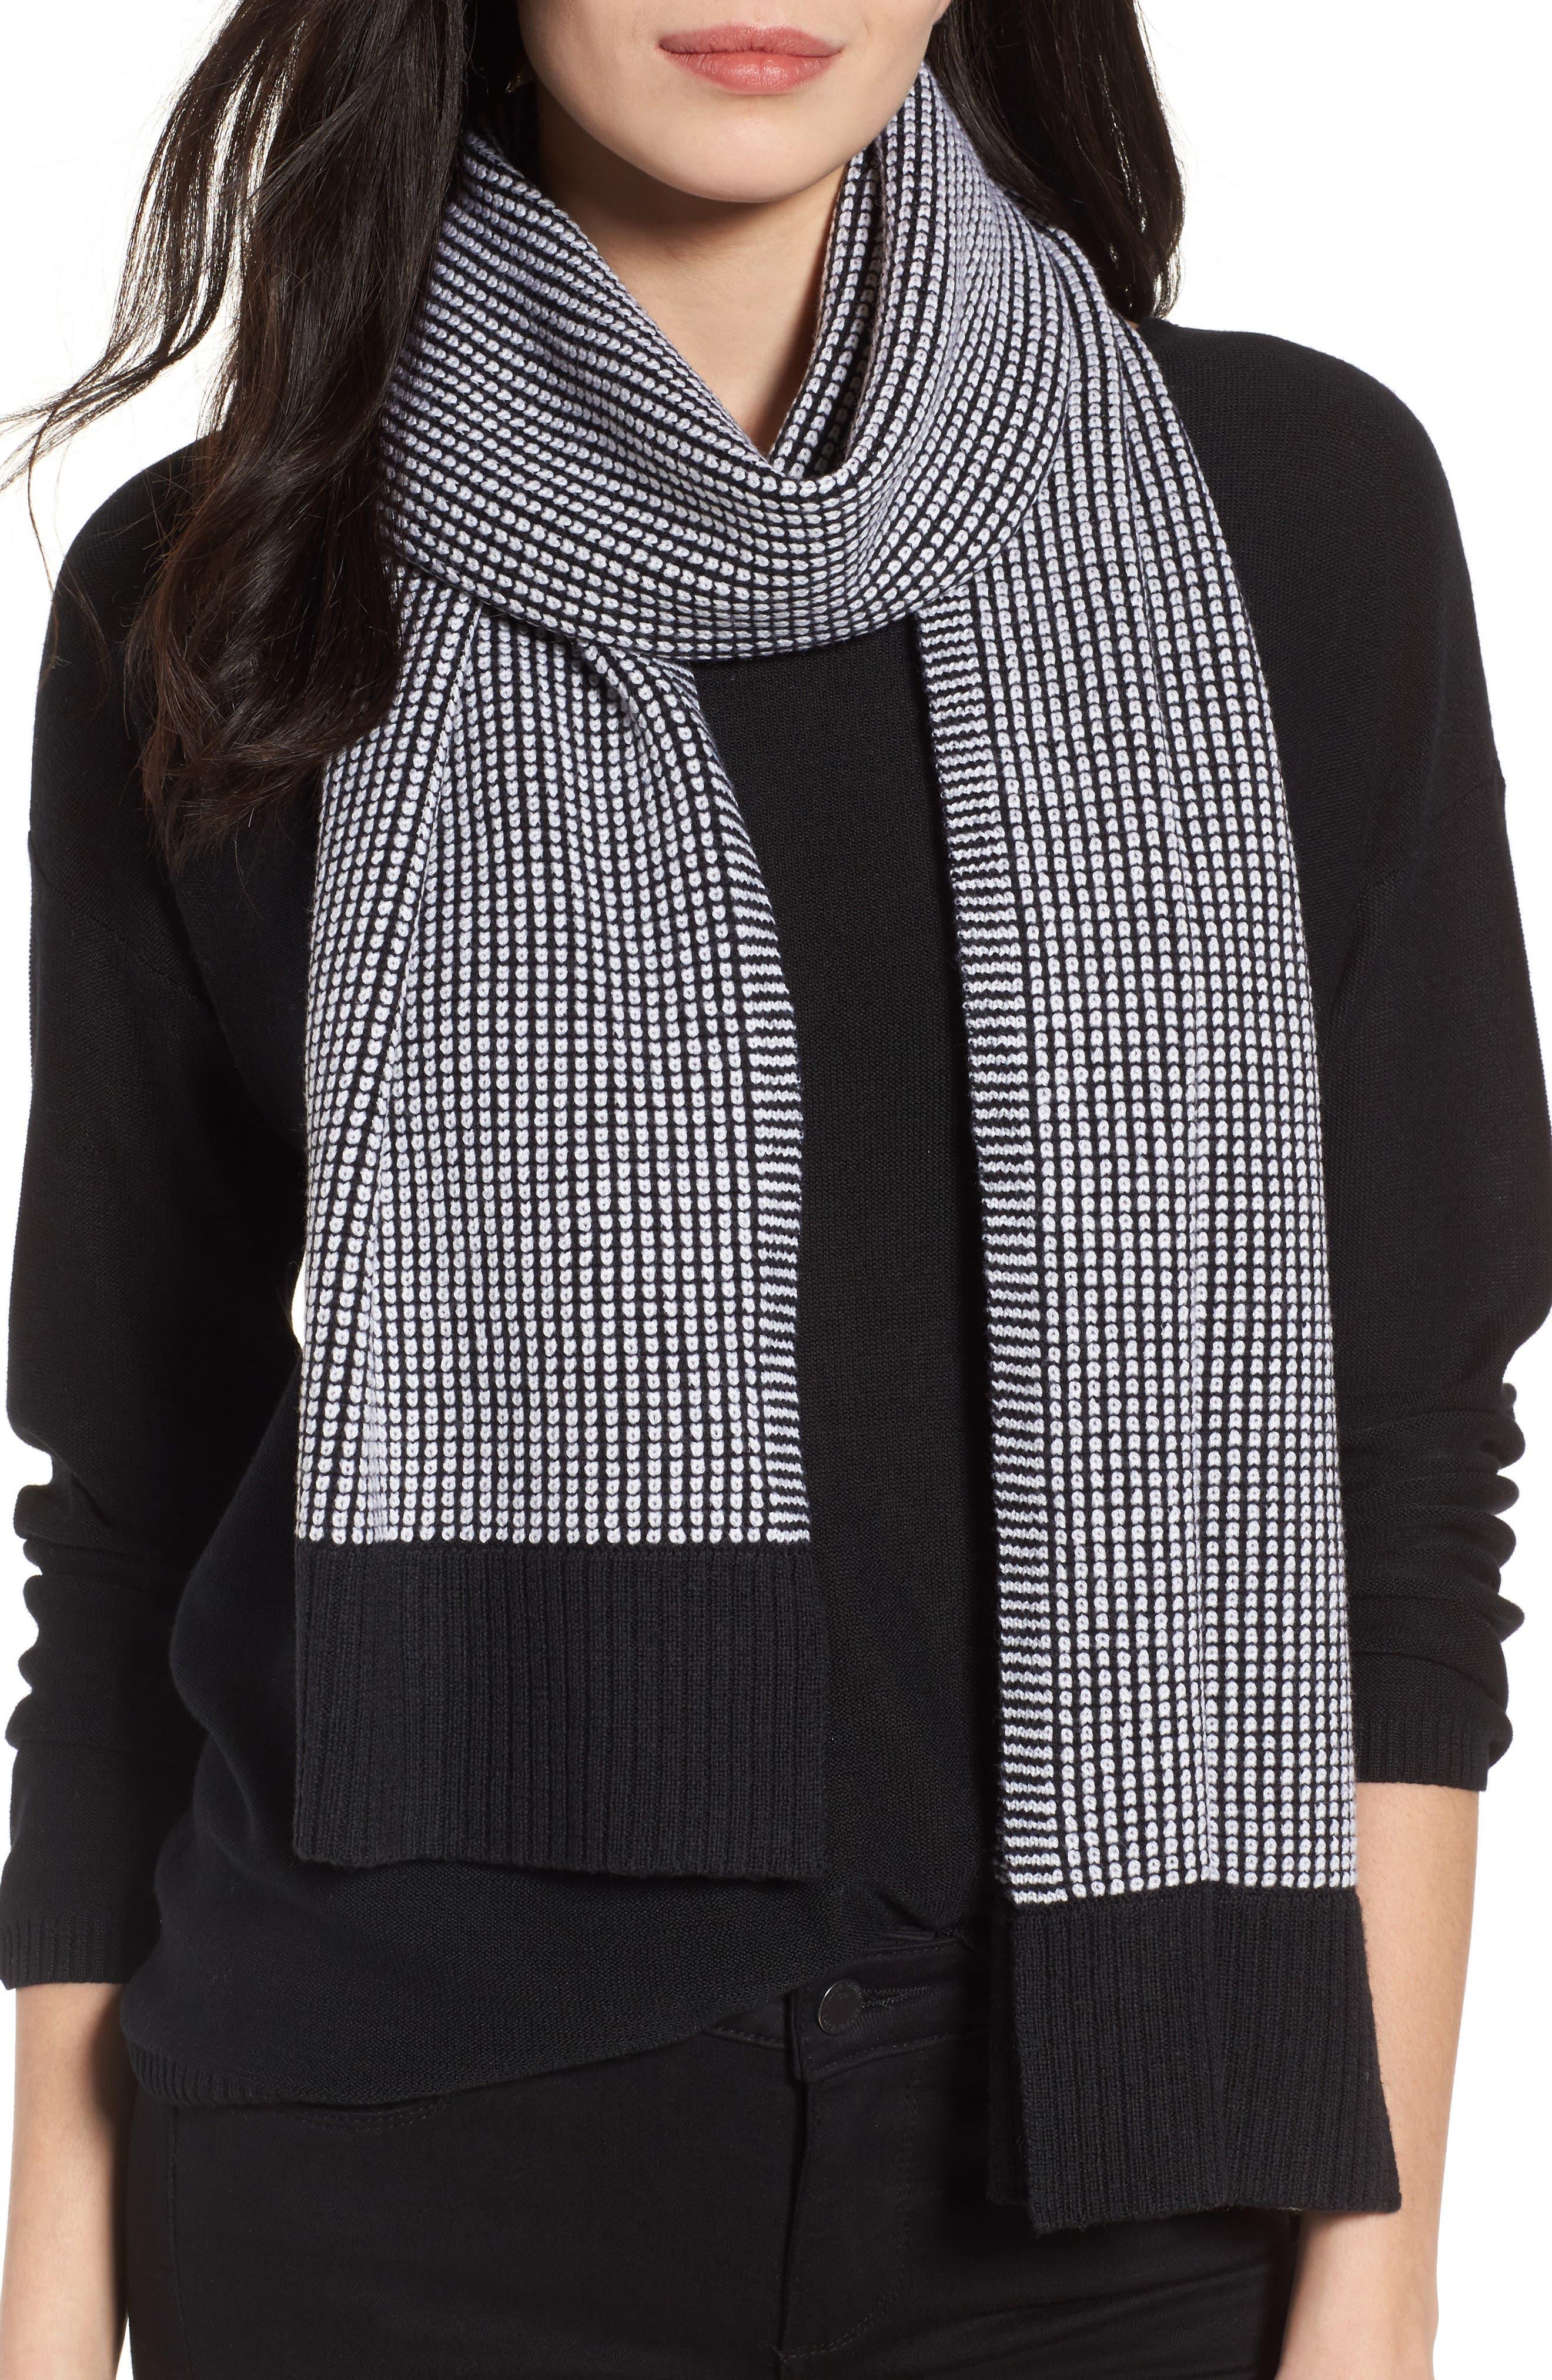 Merino Wool Scarf,                             Main thumbnail 1, color,                             Black/ Soft White